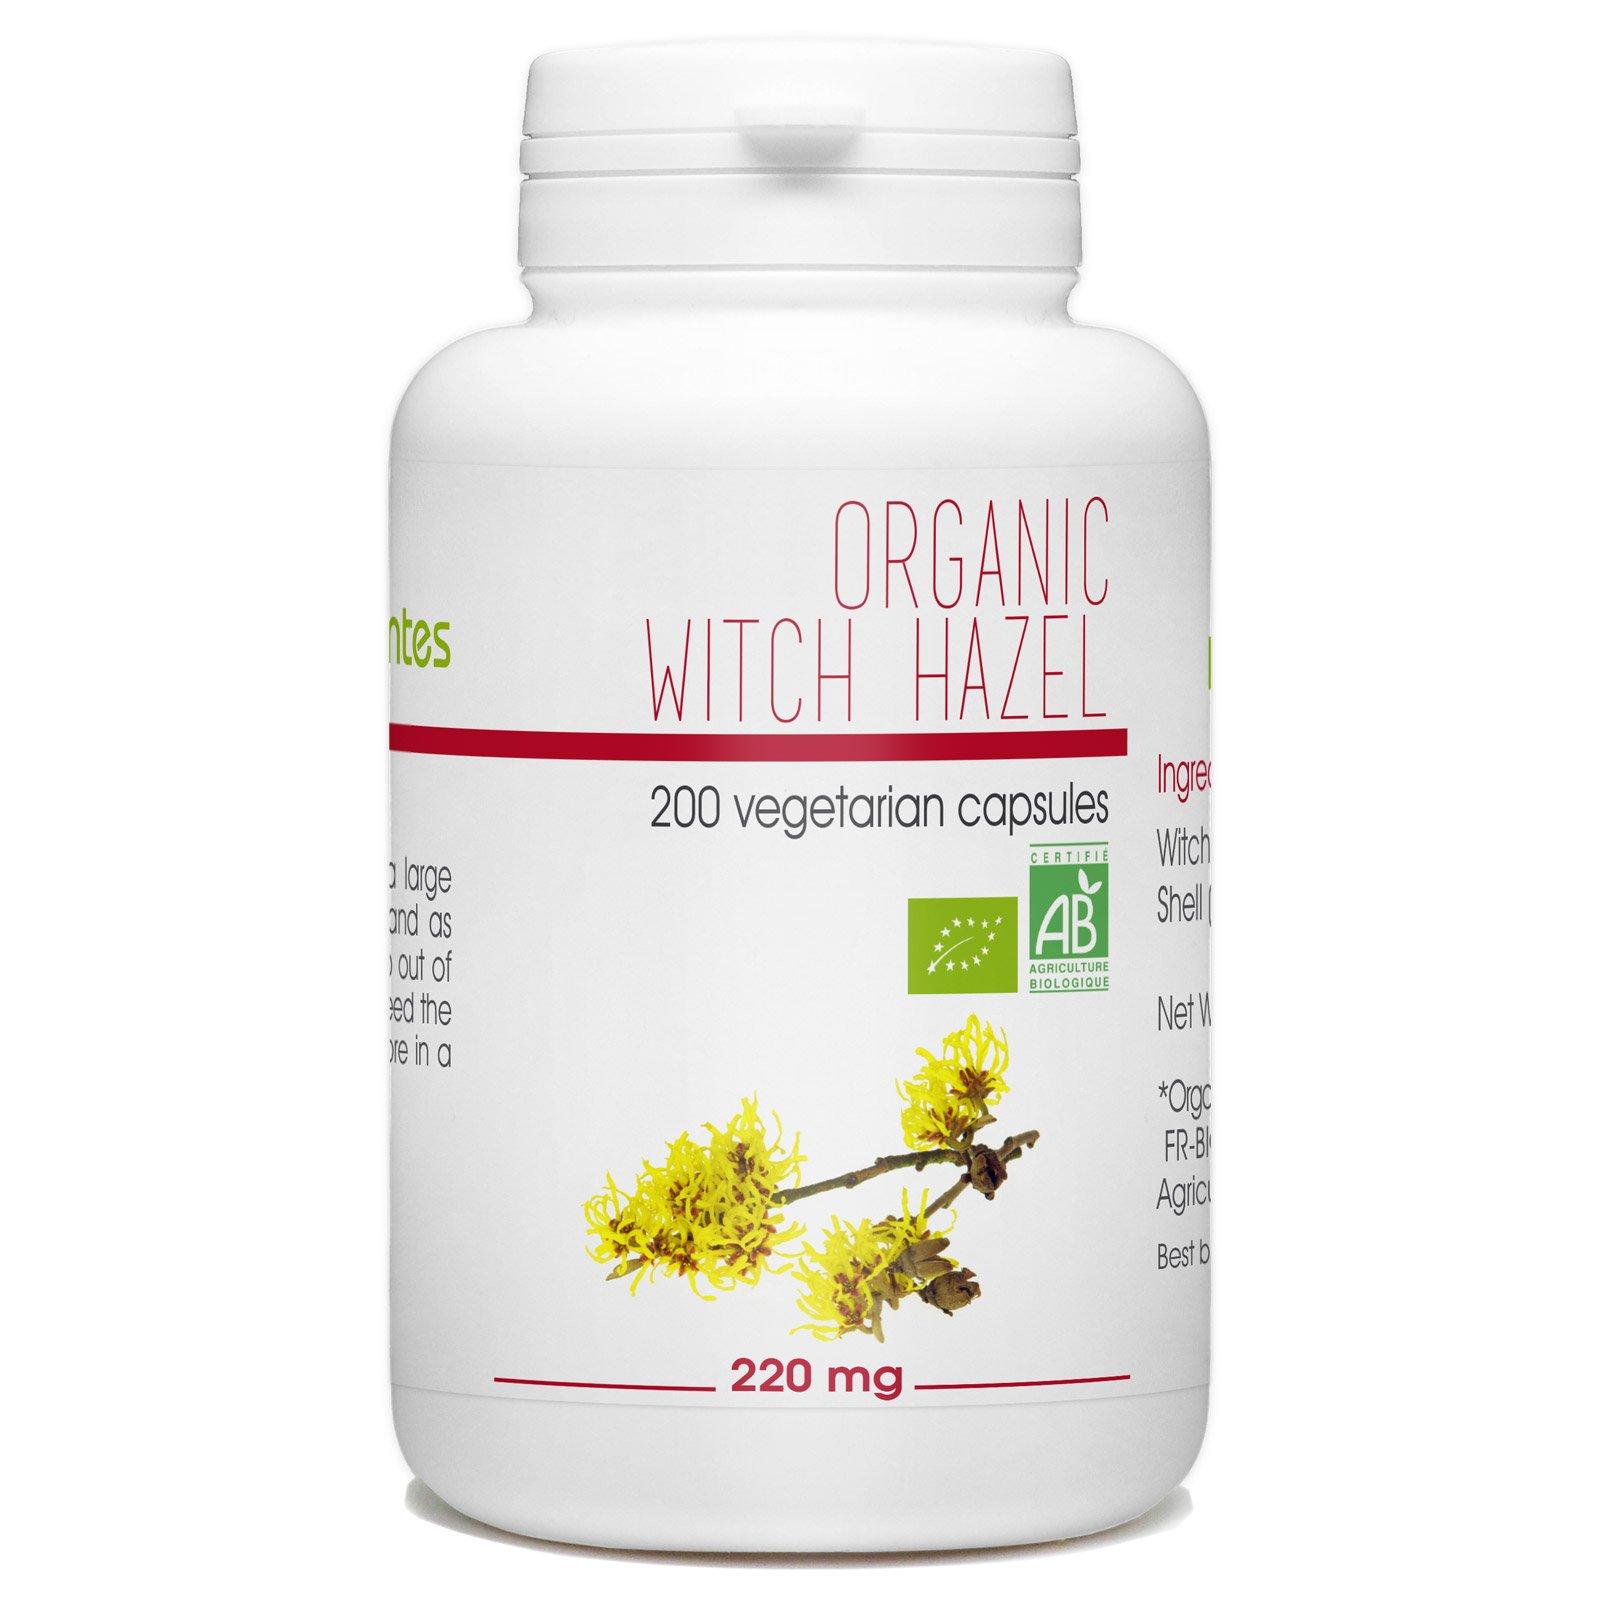 Witch Hazel - Hamamelis Organic 200 Vegetarian Capsules 220 mg by Nature Land Candles